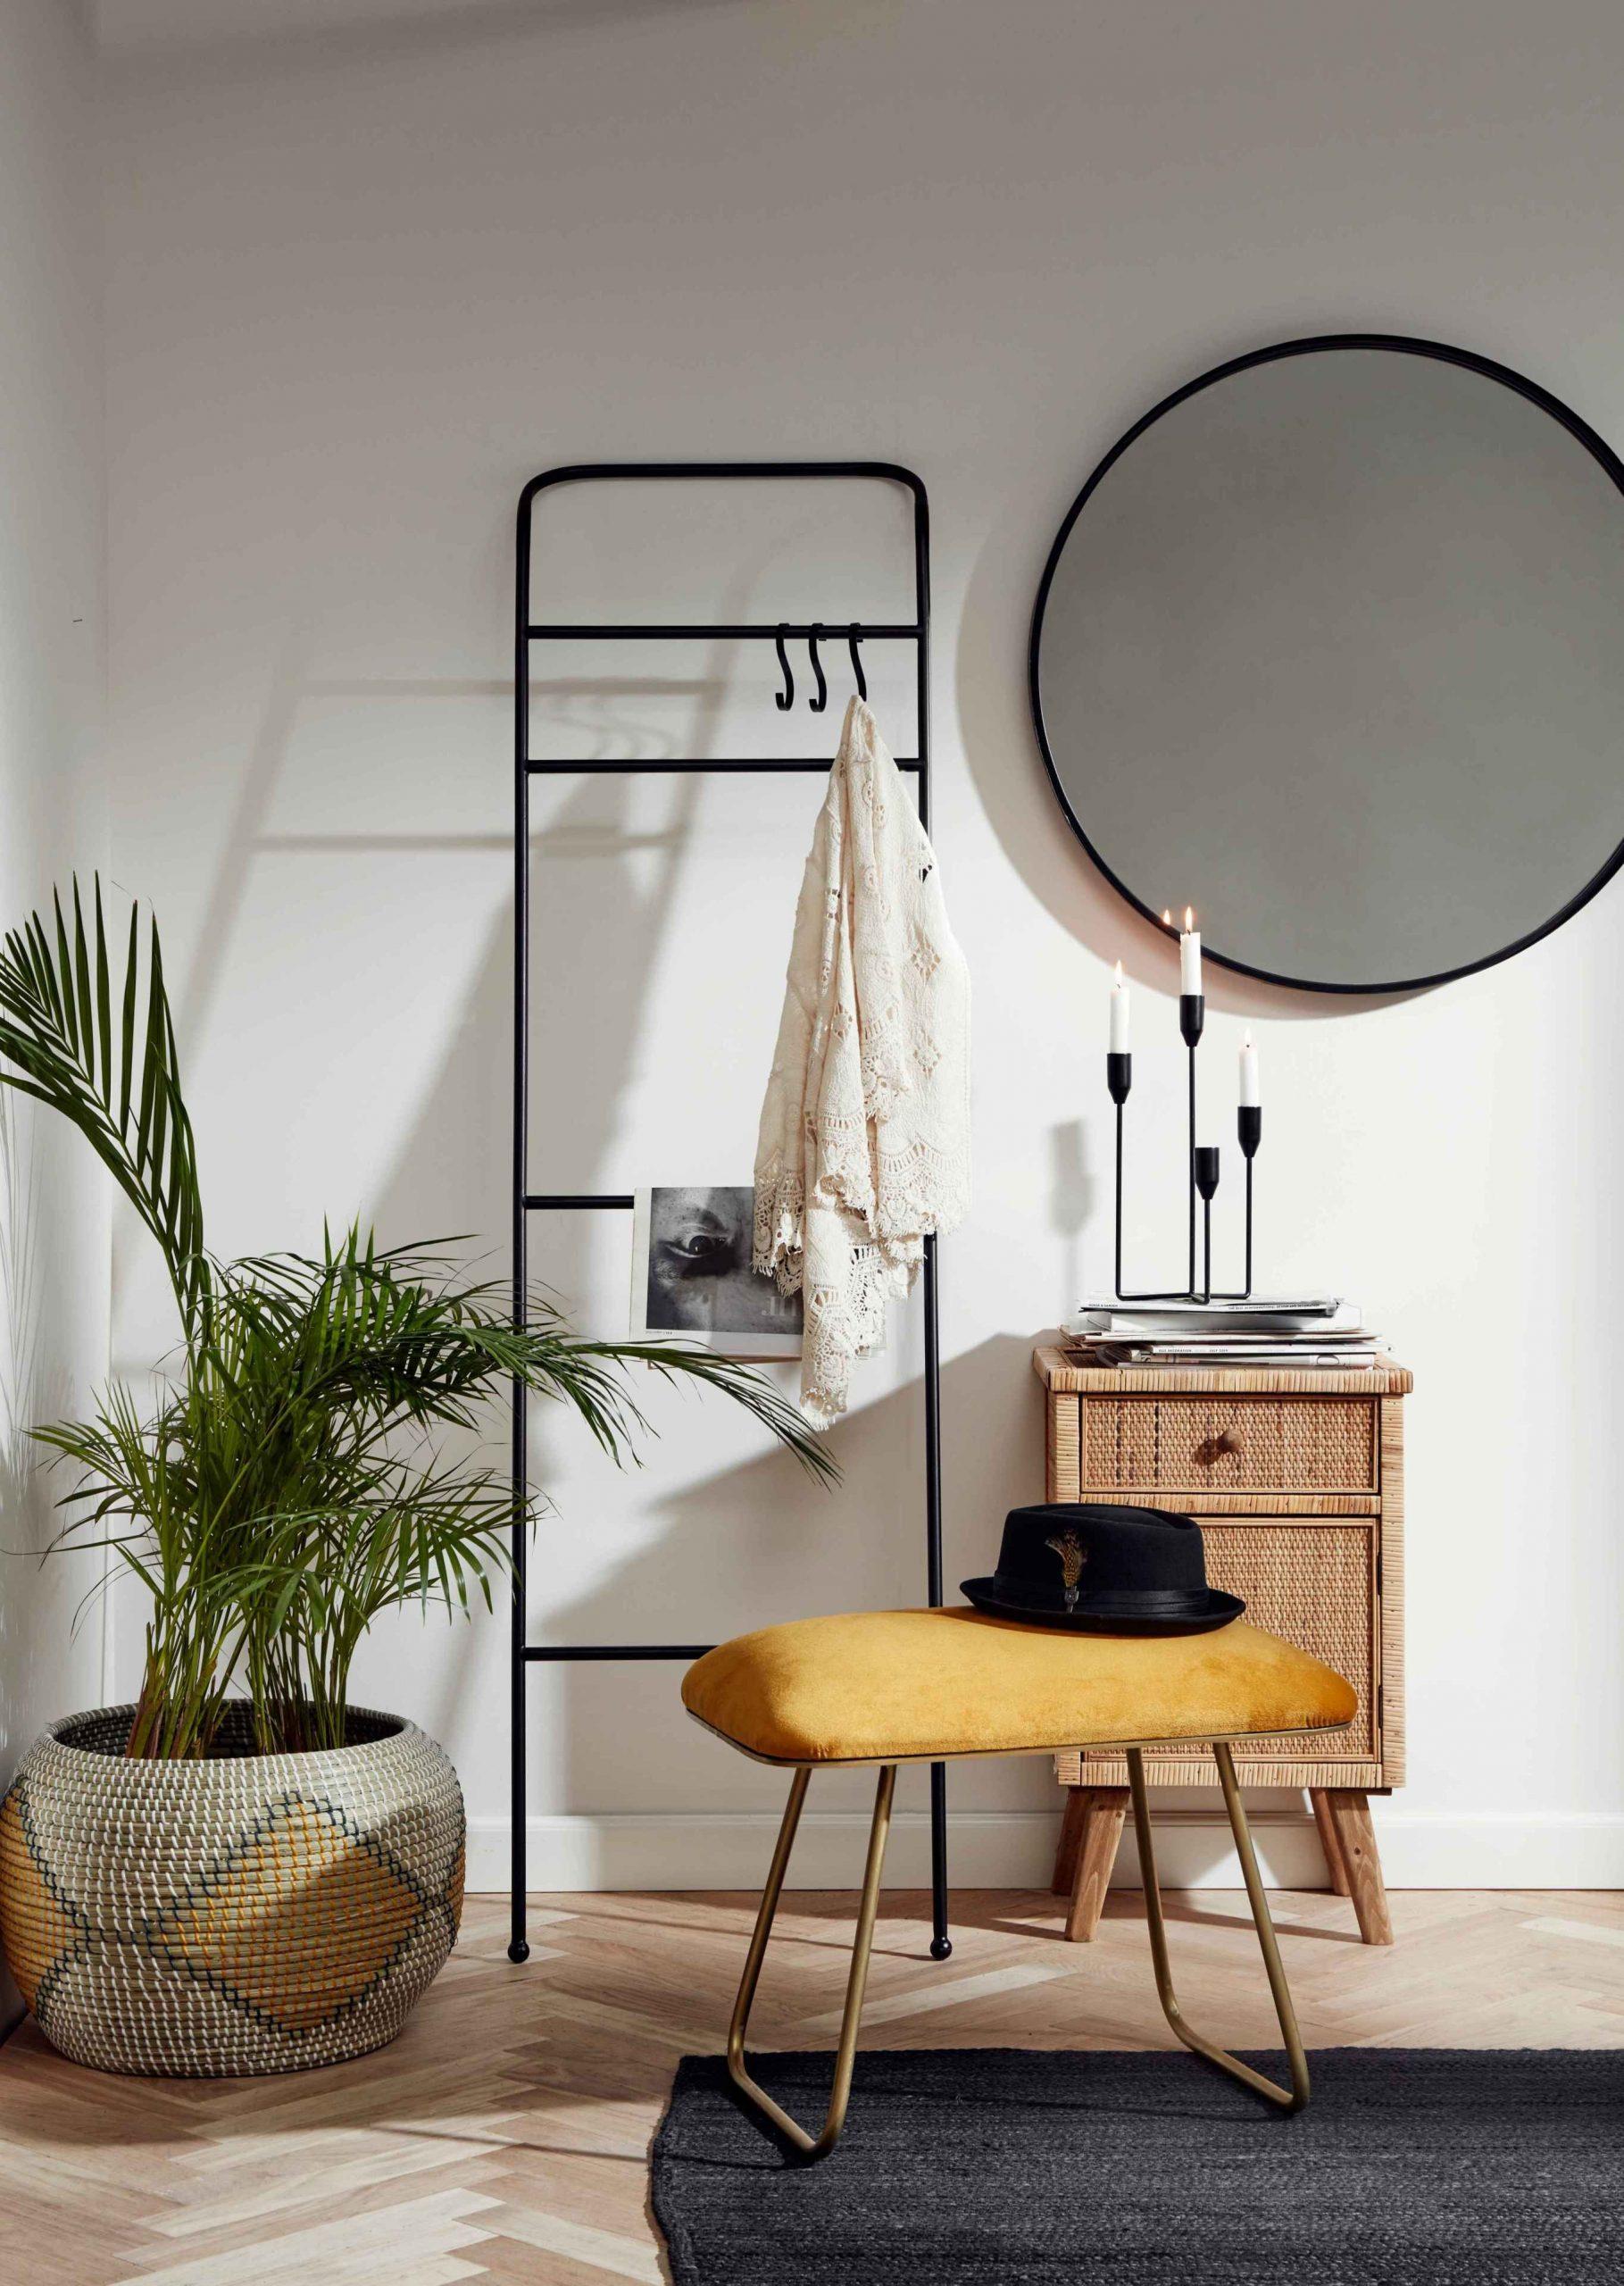 Metal Rack In 2020 | Decor, Interior, Home Decor à Living Store Nantes